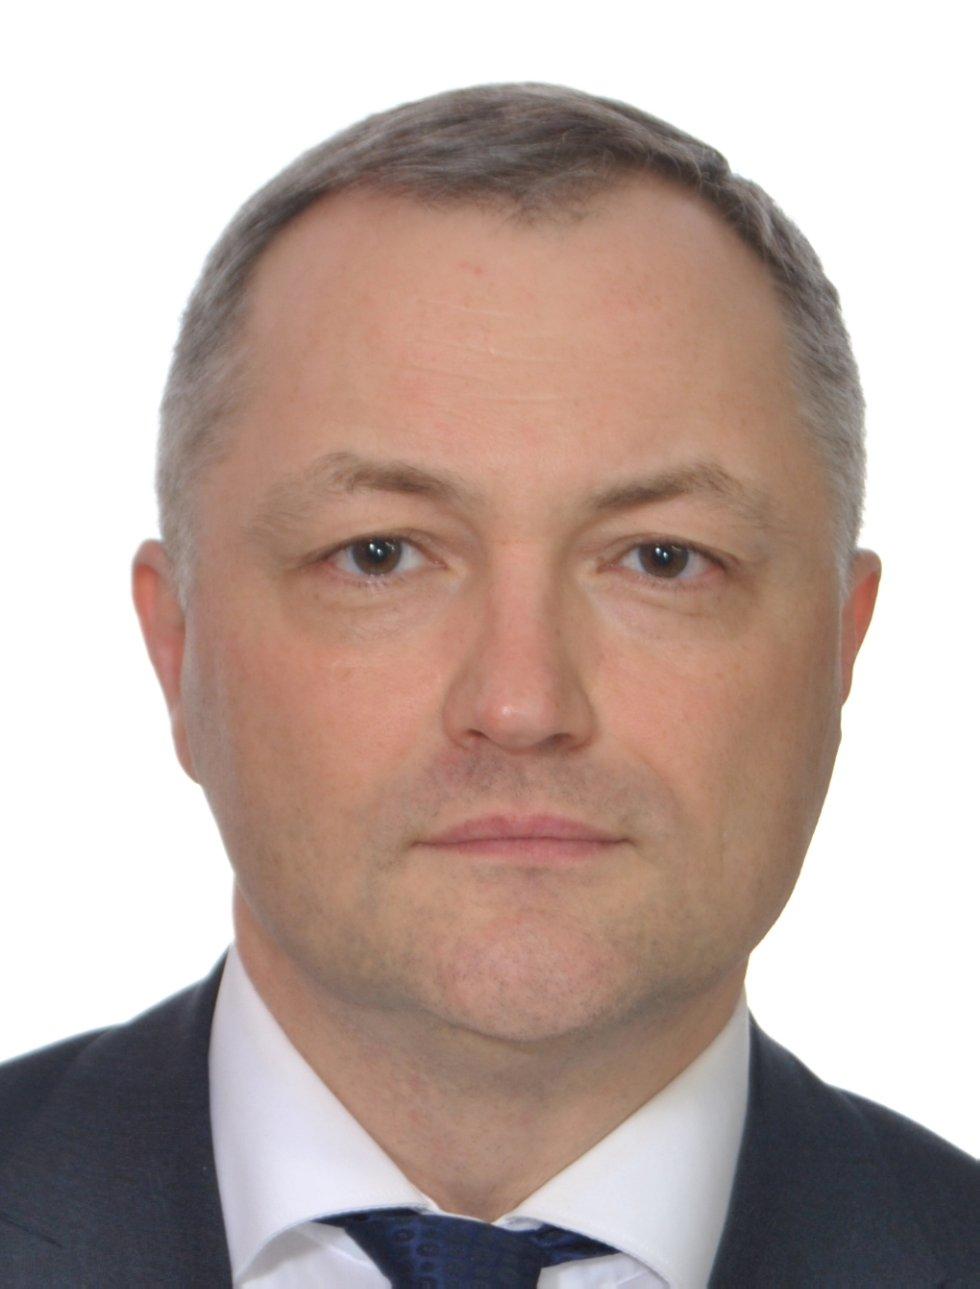 Арсланов Камиль Маратович